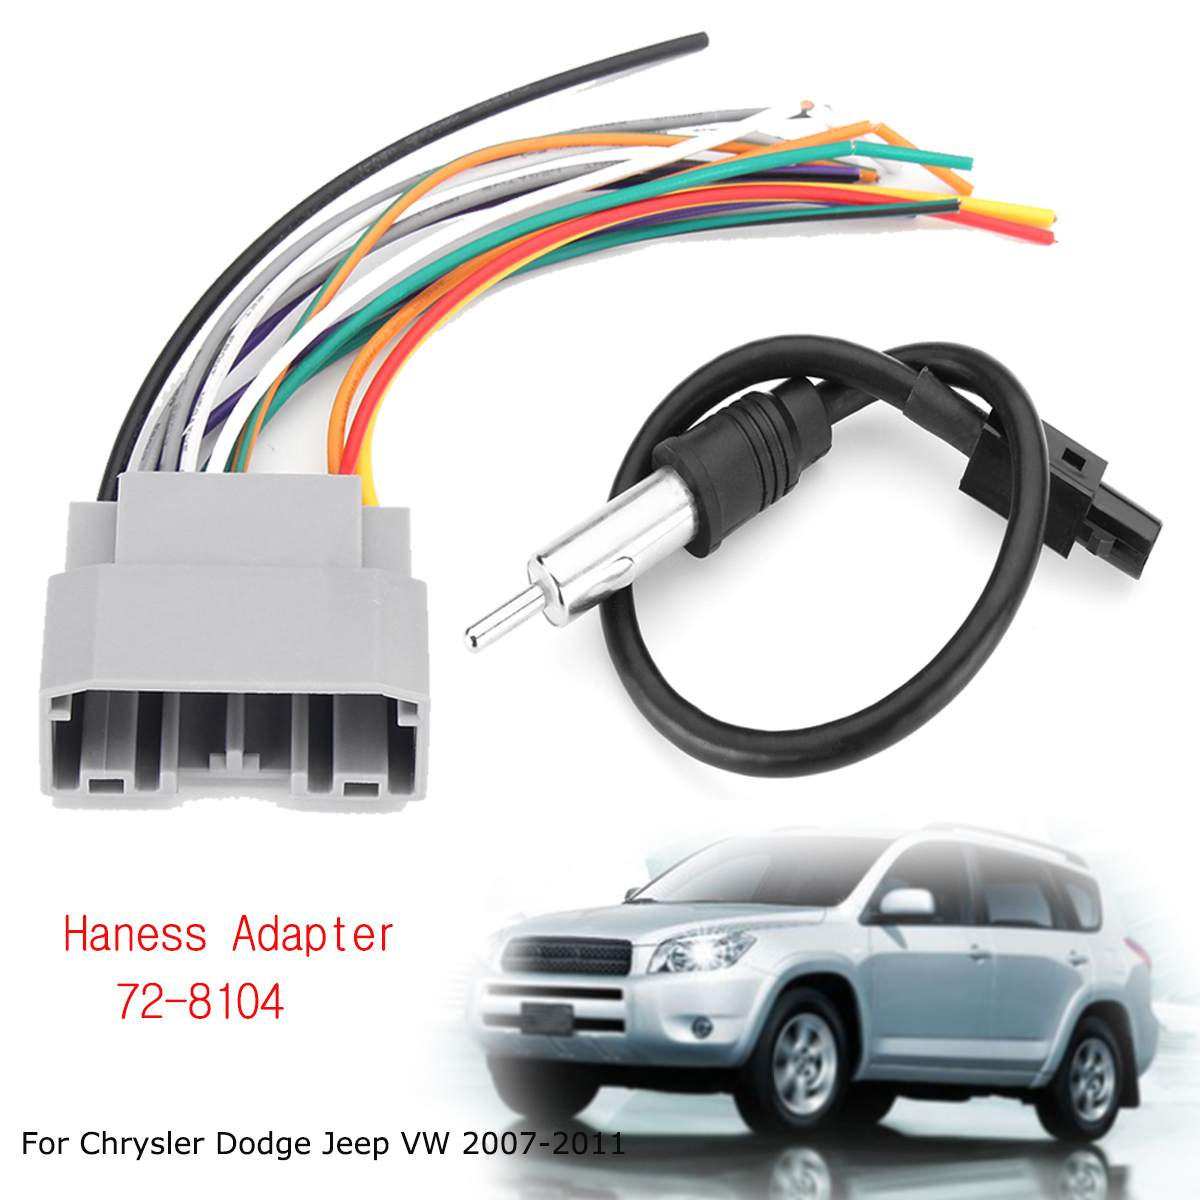 car stereo wiring harness adapter for vw    car       stereo       wiring       harness       adapter    antenna for chrysler for     car       stereo       wiring       harness       adapter    antenna for chrysler for